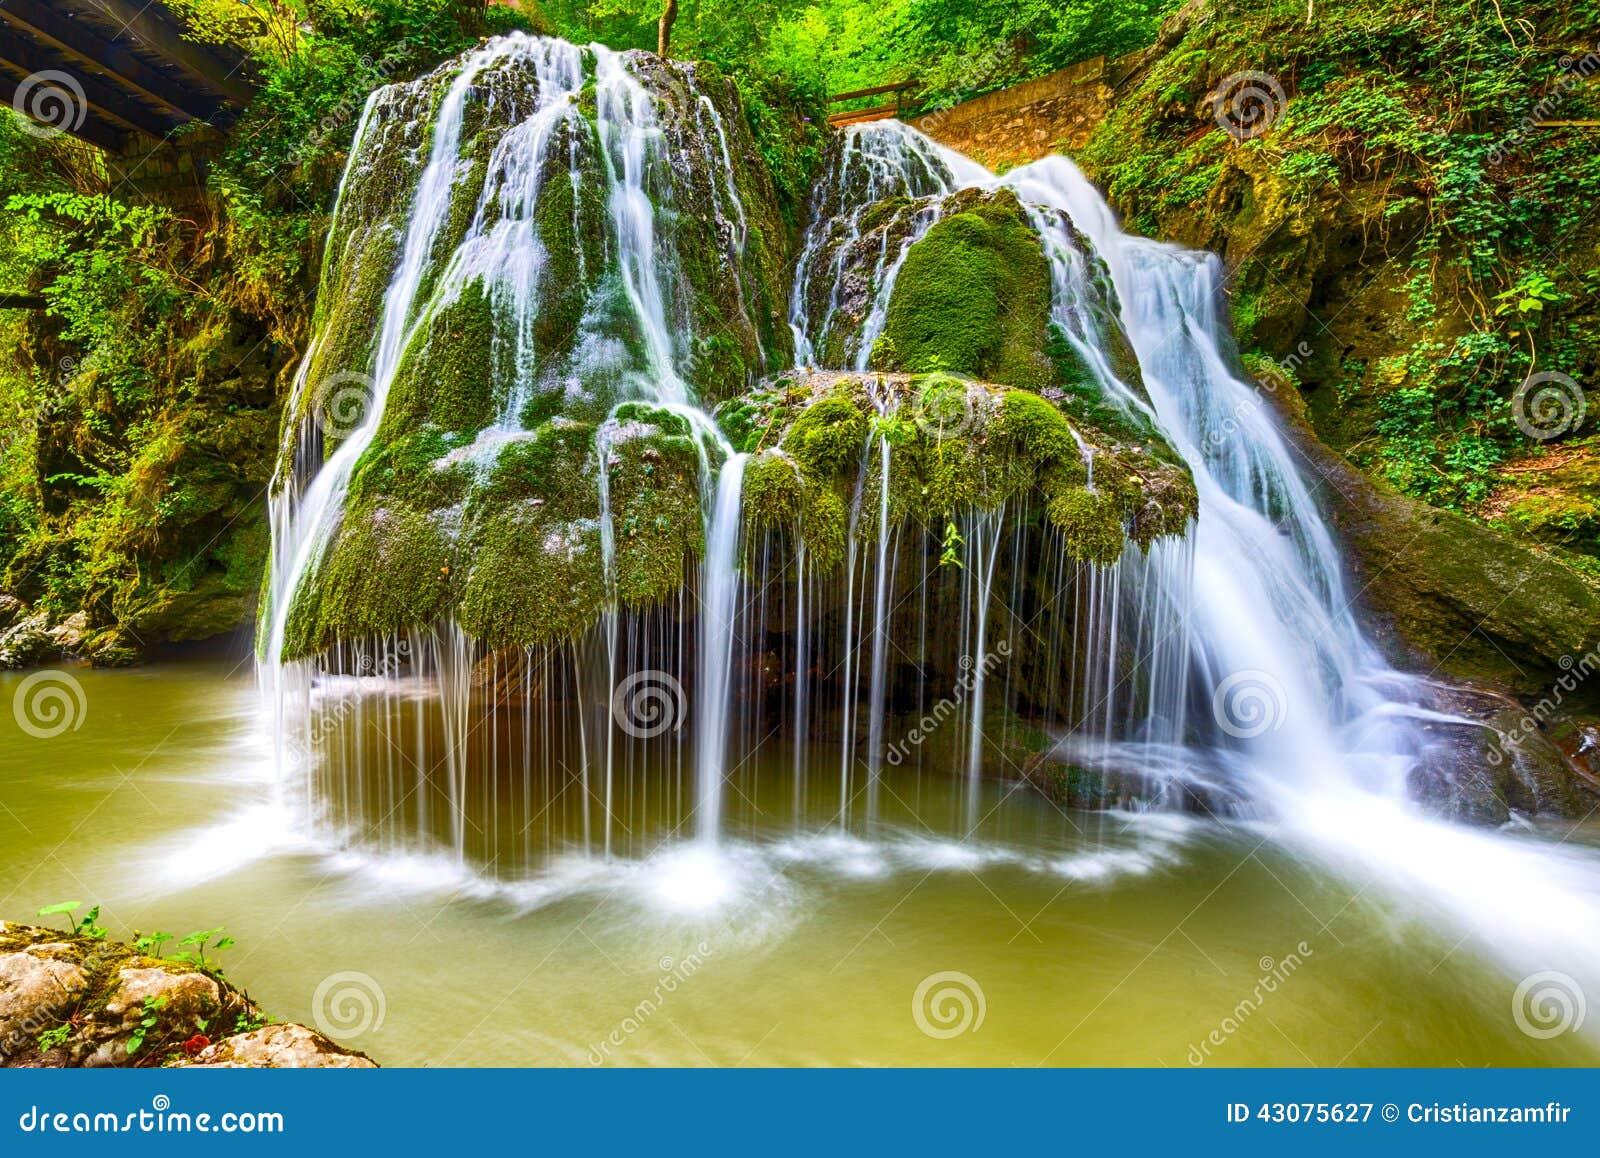 Waterfall Bigar